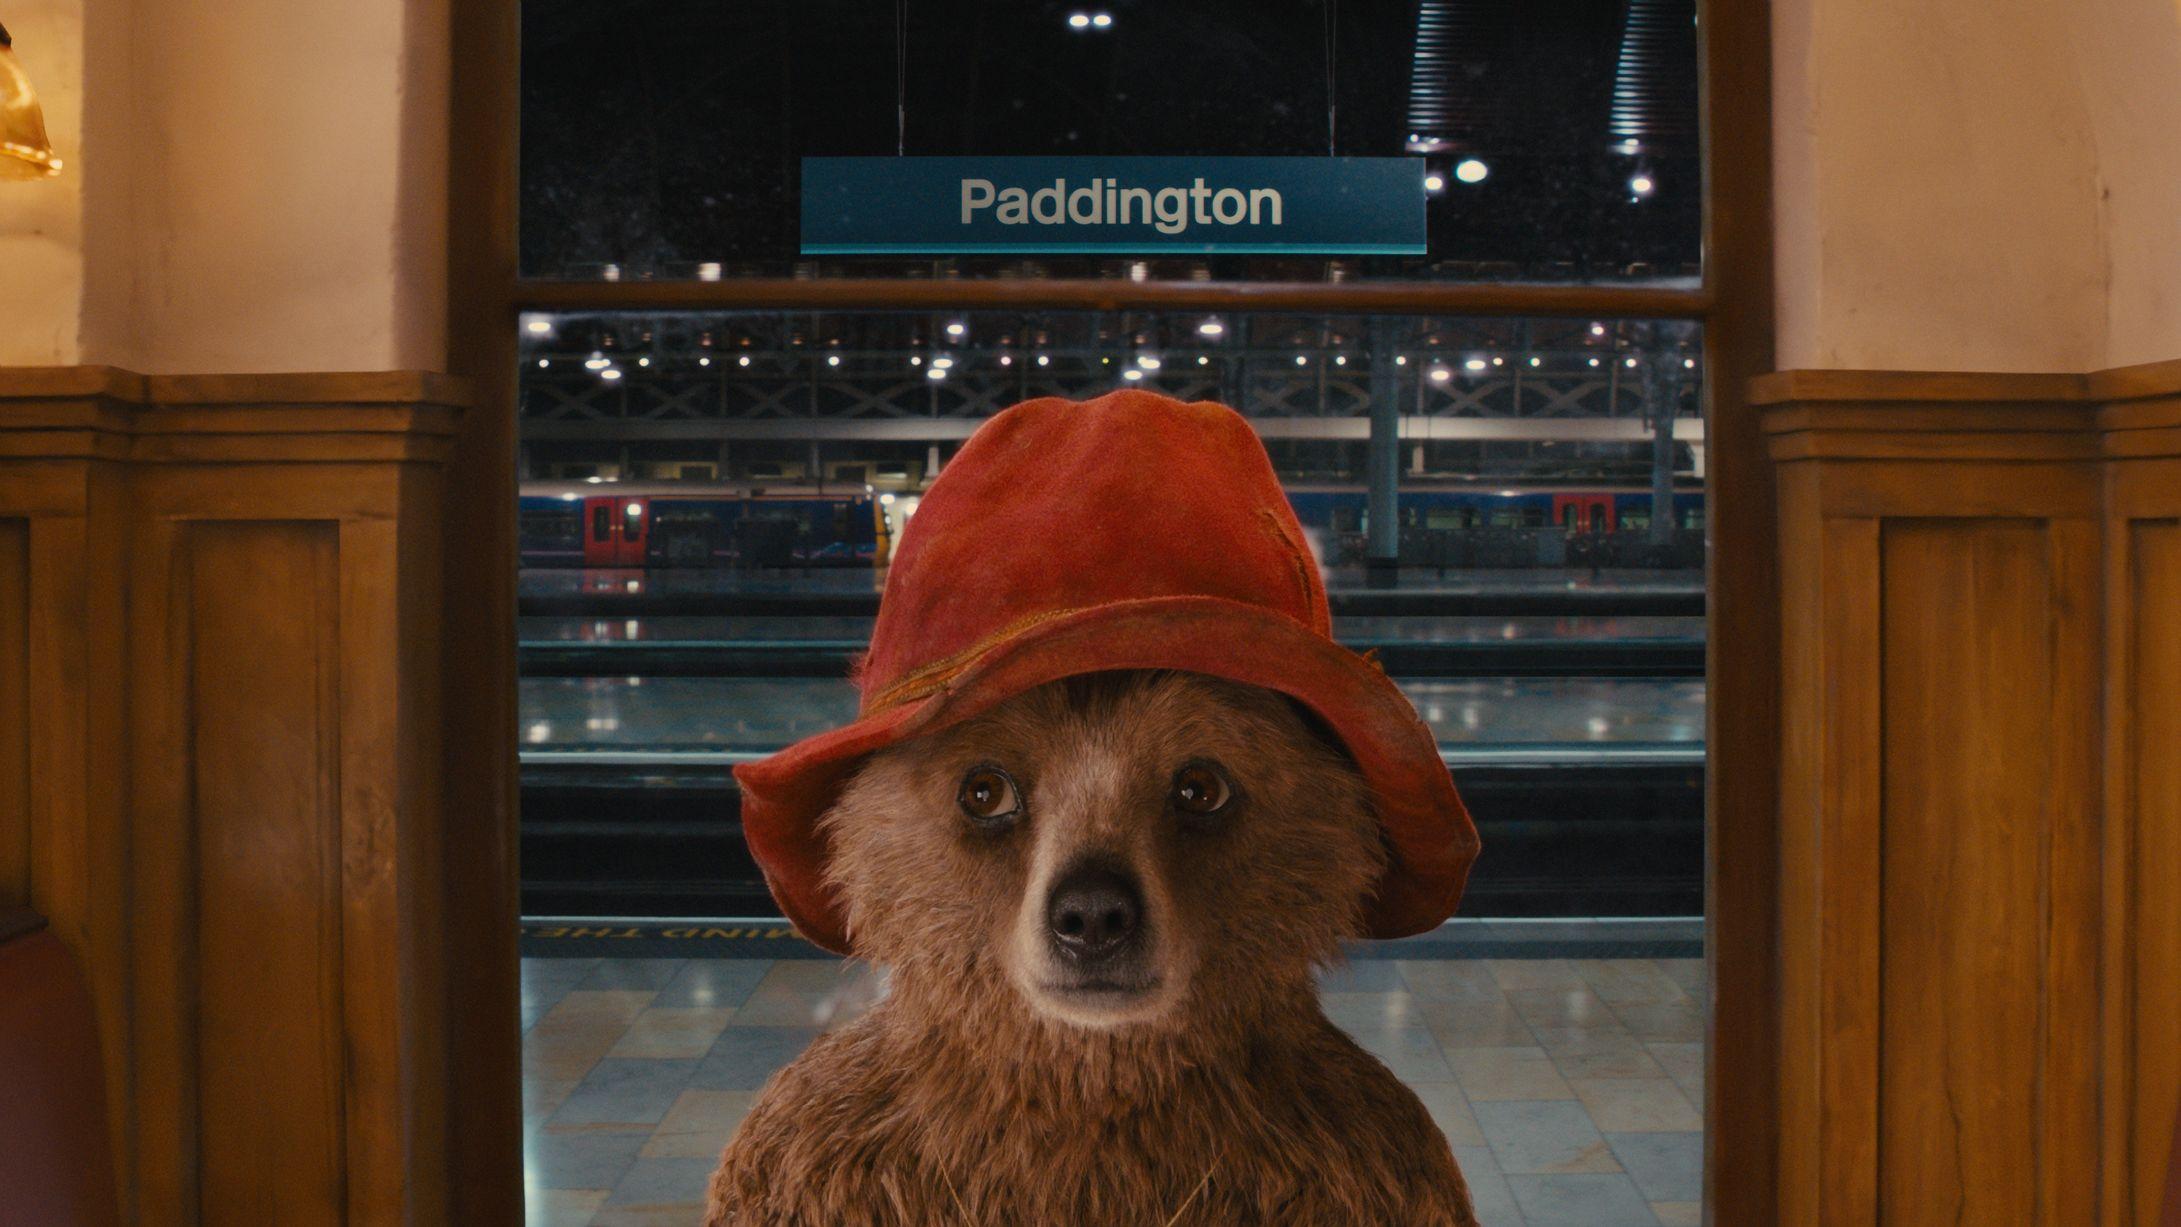 Paddington makes an impact in BAFTA Nominations